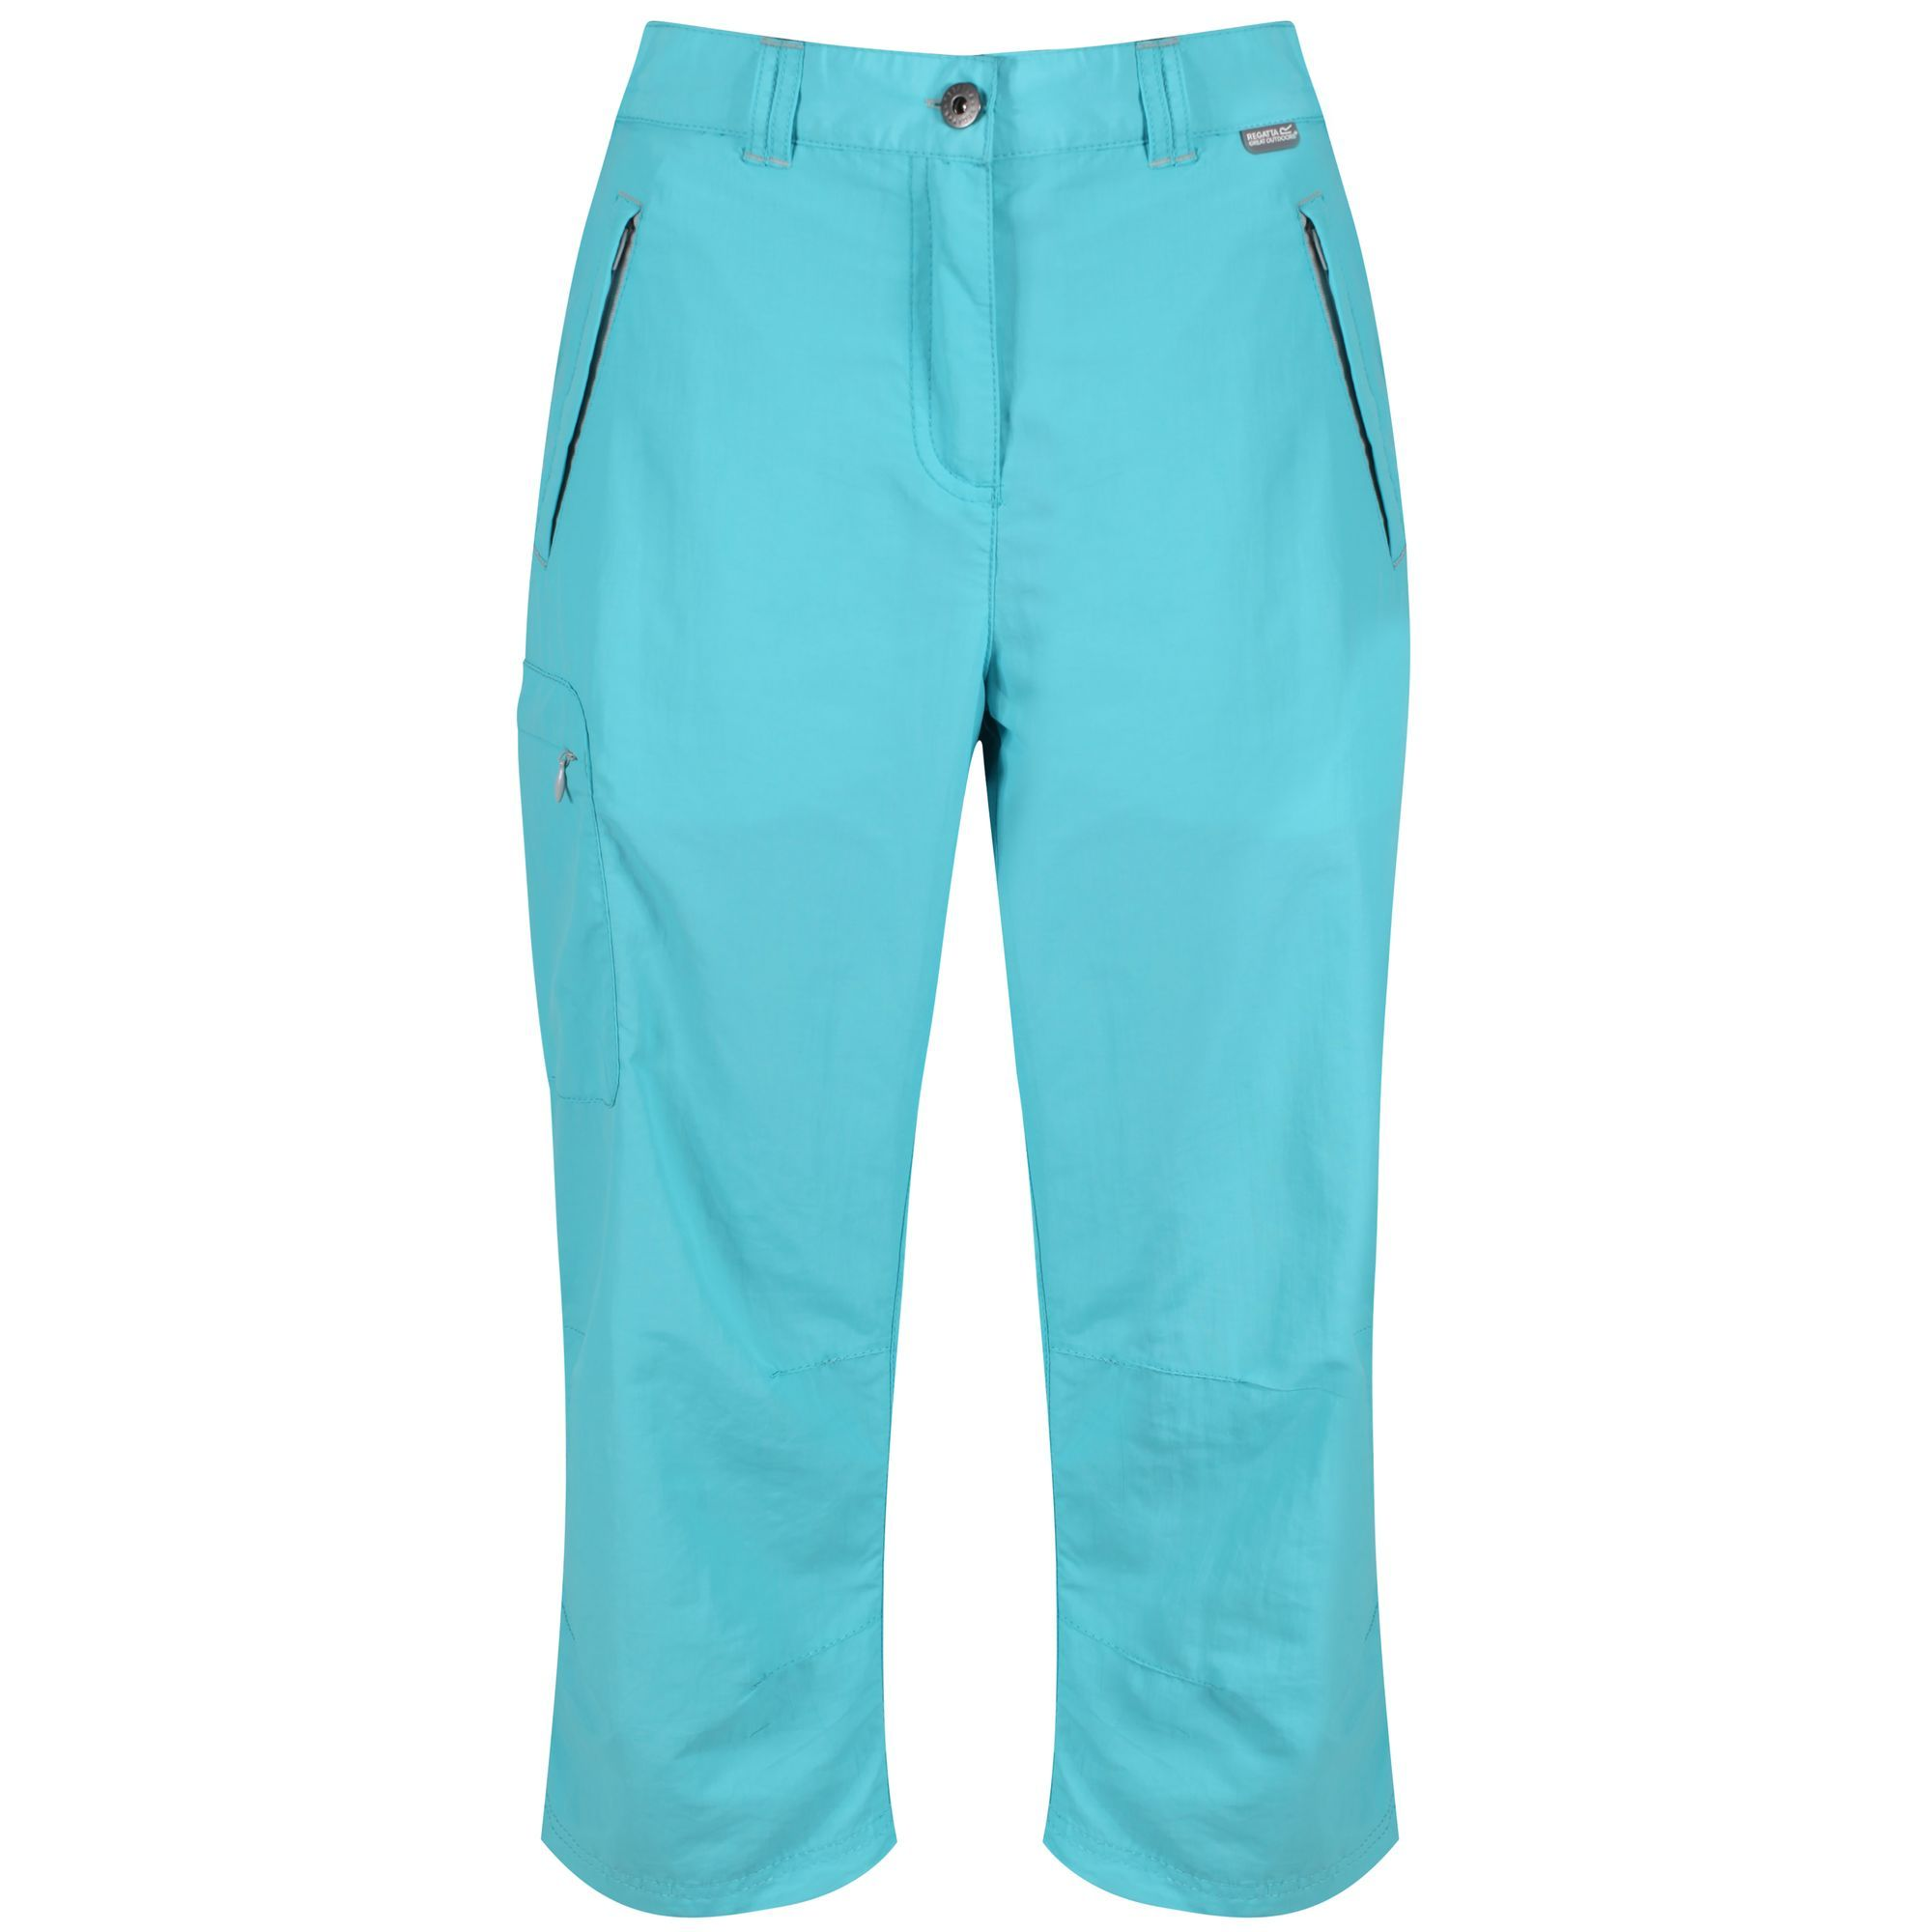 Regatta Great Outdoors Womens/Ladies Chaska 3/4 Capri Shorts